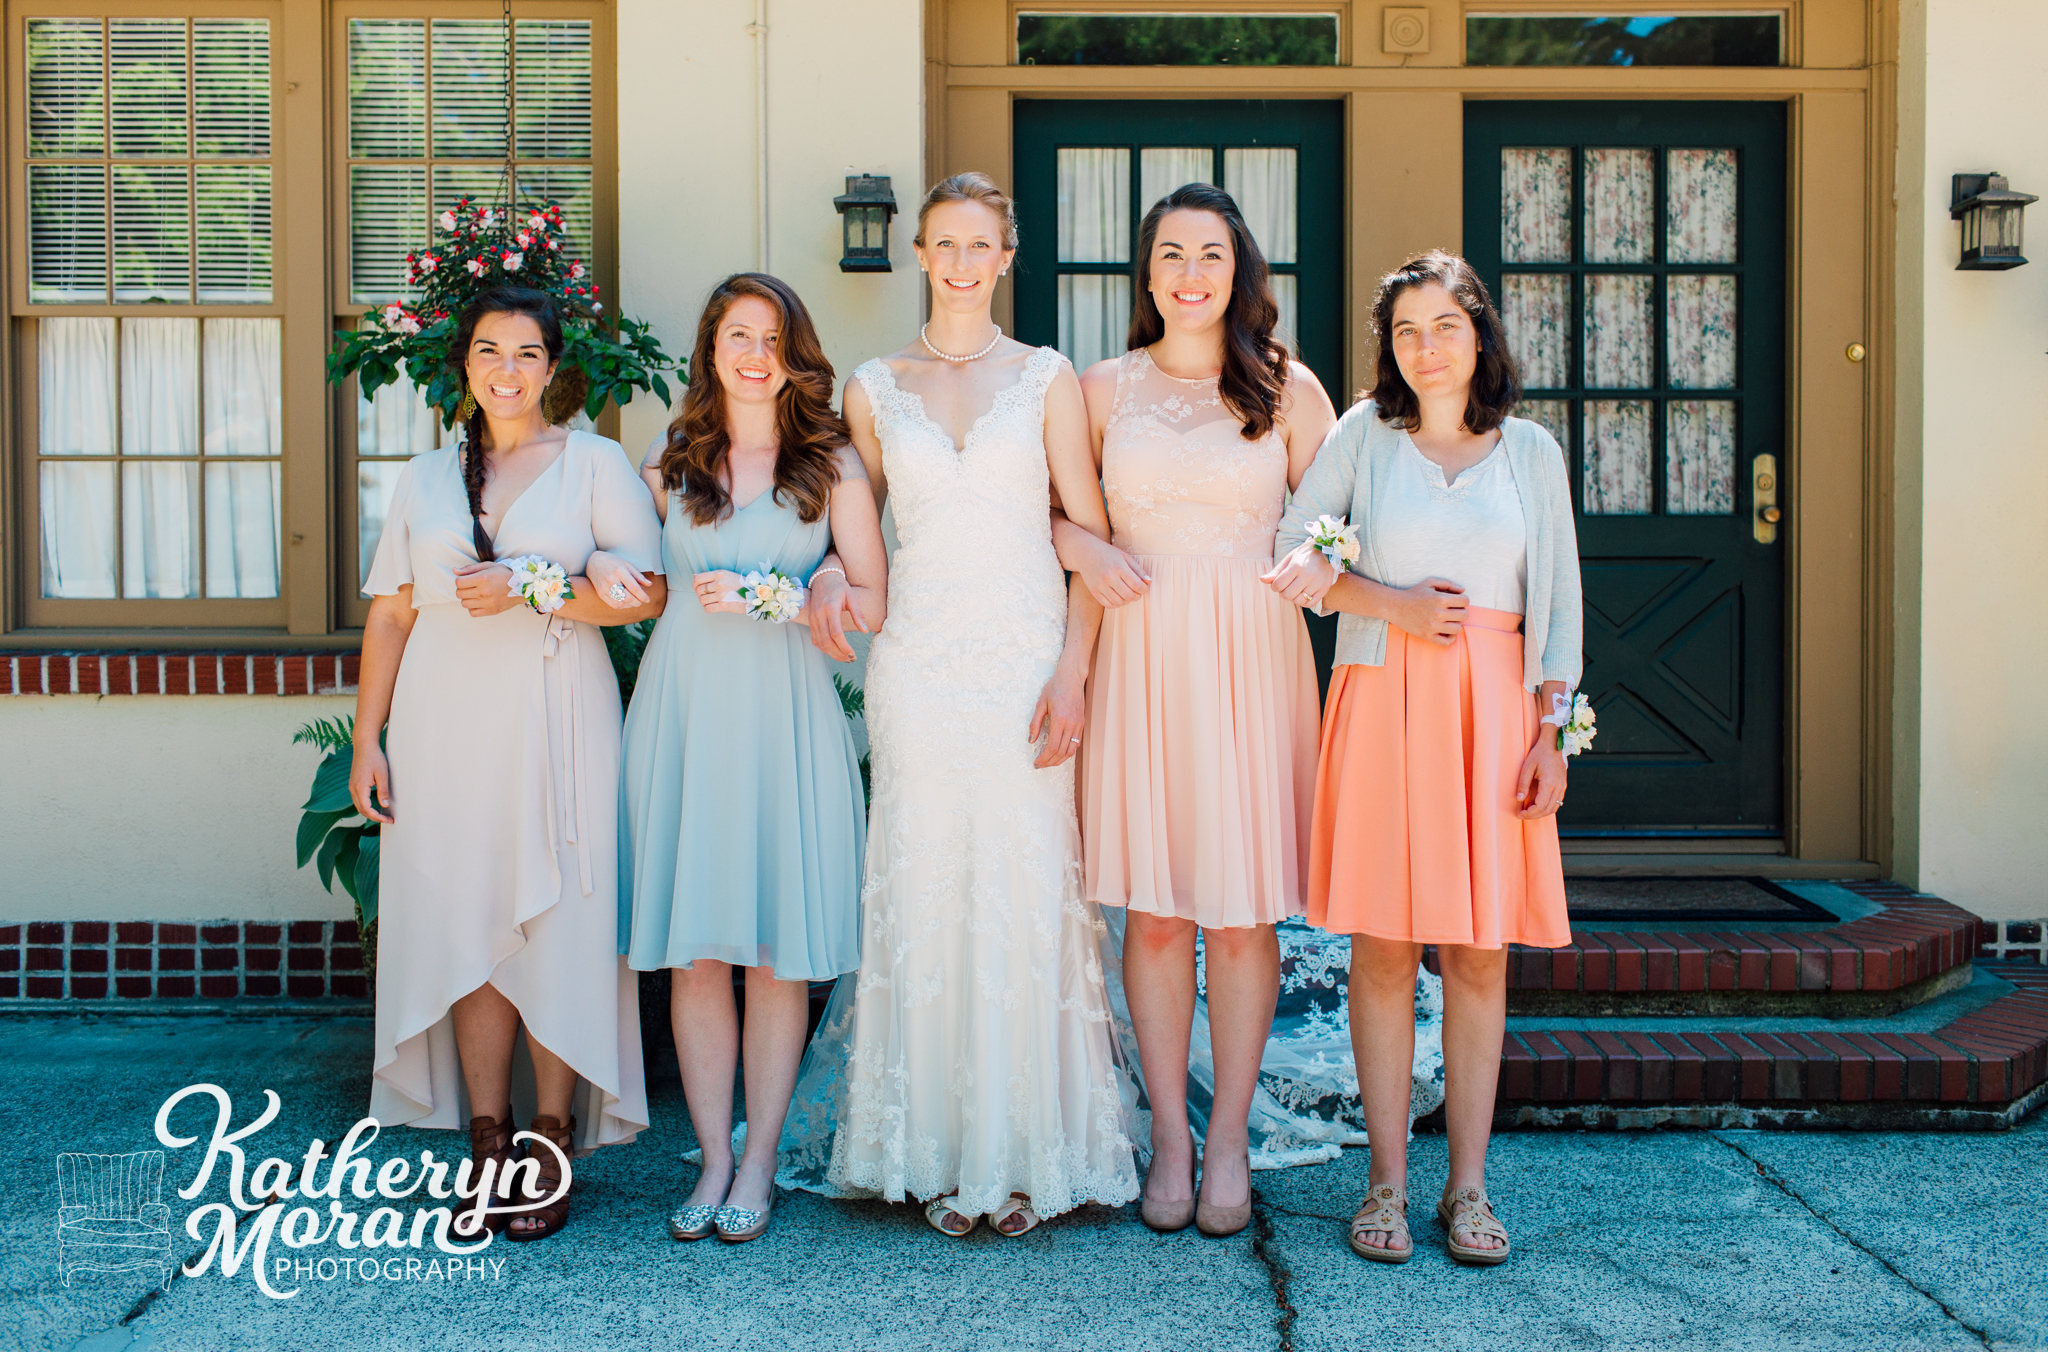 bellingham-wedding-photographer-lairmont-manor-katheryn-moran-11.jpg